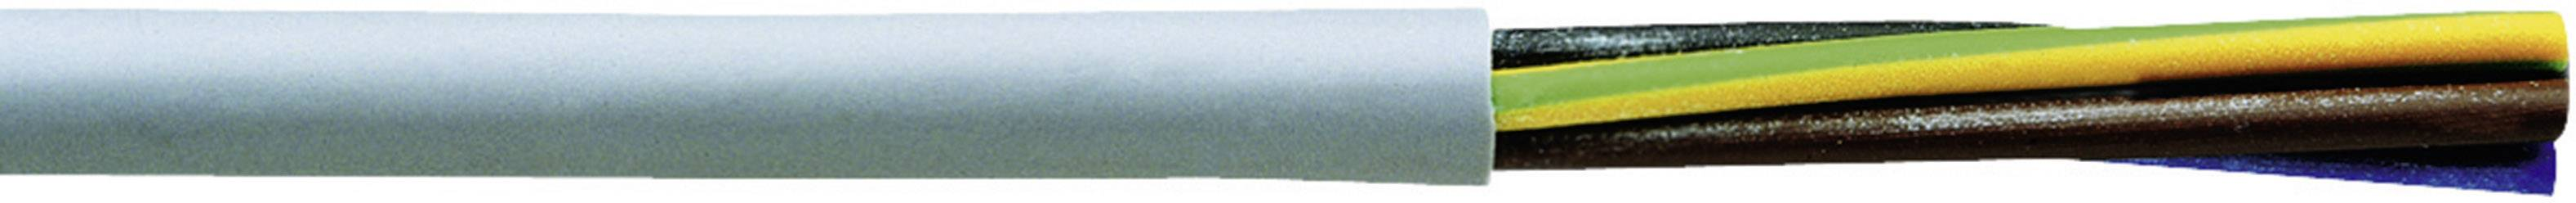 Řídicí kabel Faber Kabel Y-JB (030867), 6,1 mm, 500 V, šedá, 1 m